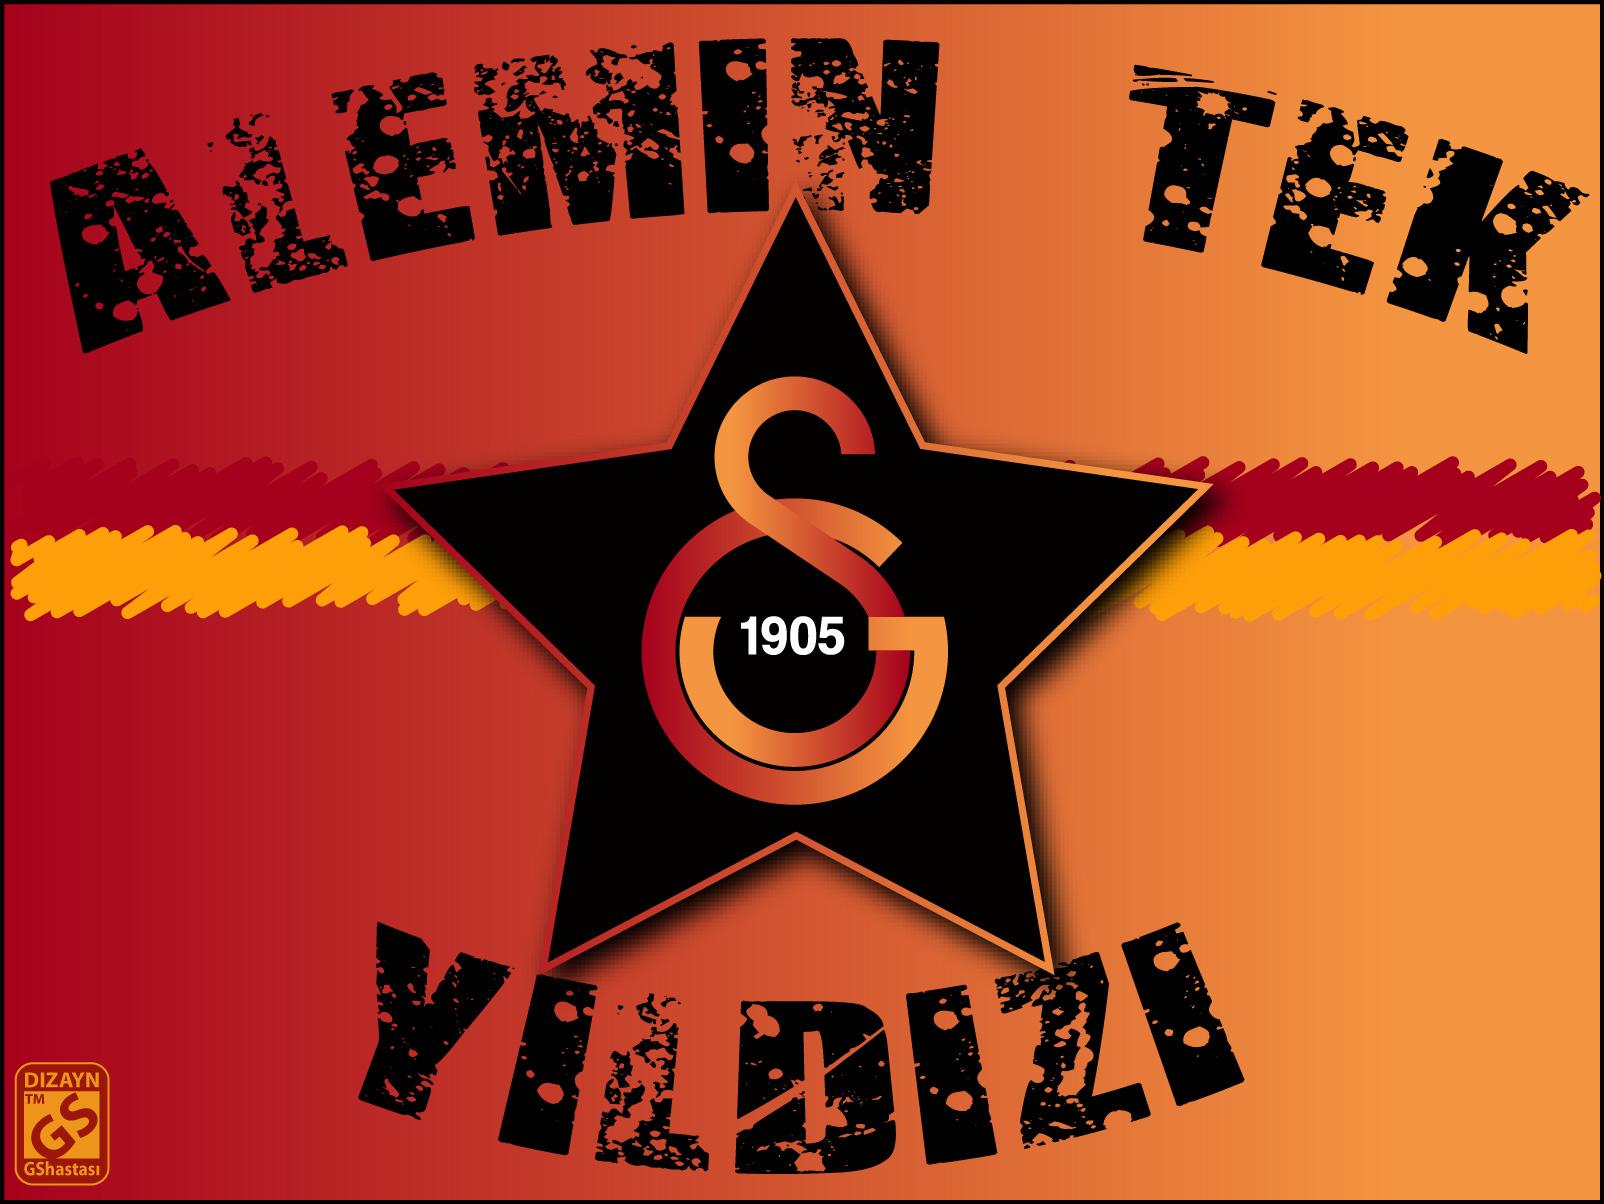 http://fc04.deviantart.net/fs37/f/2008/279/2/b/Tek_Yildiz_Galatasaray_by_GShastasi.jpg